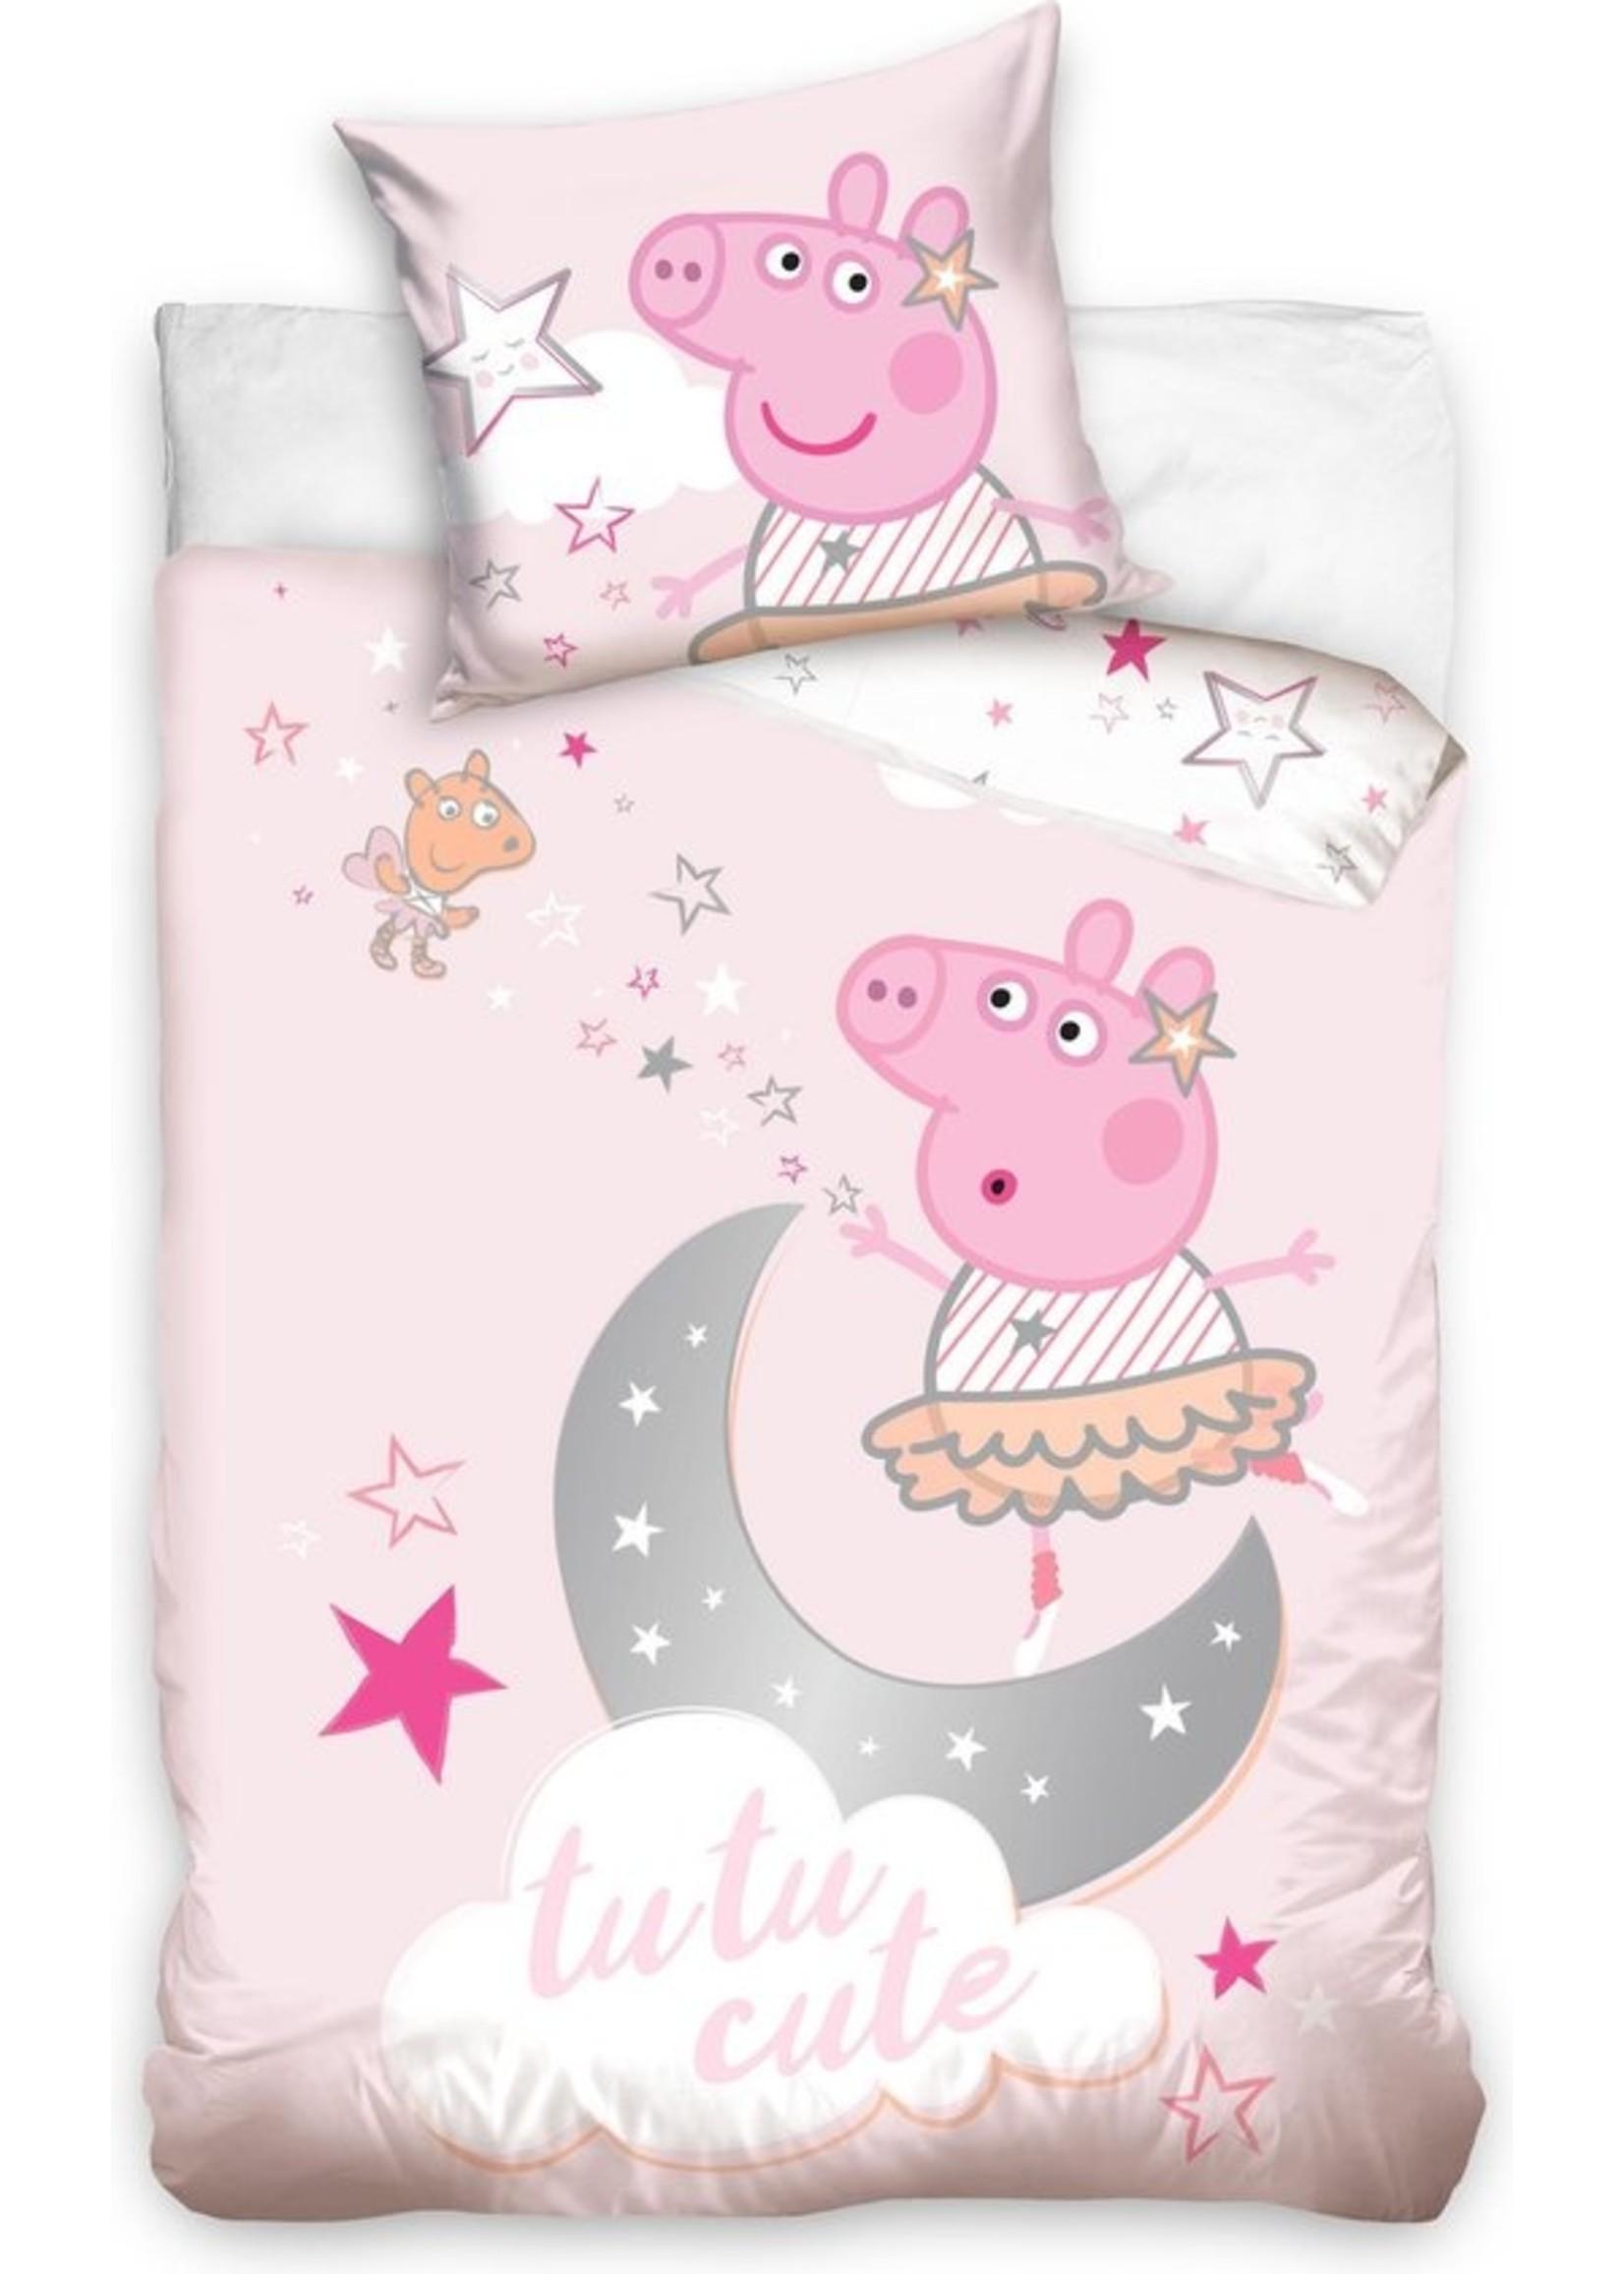 Peppa Pig Peppa Pig Junior Dekbedovertrek 100x135cm